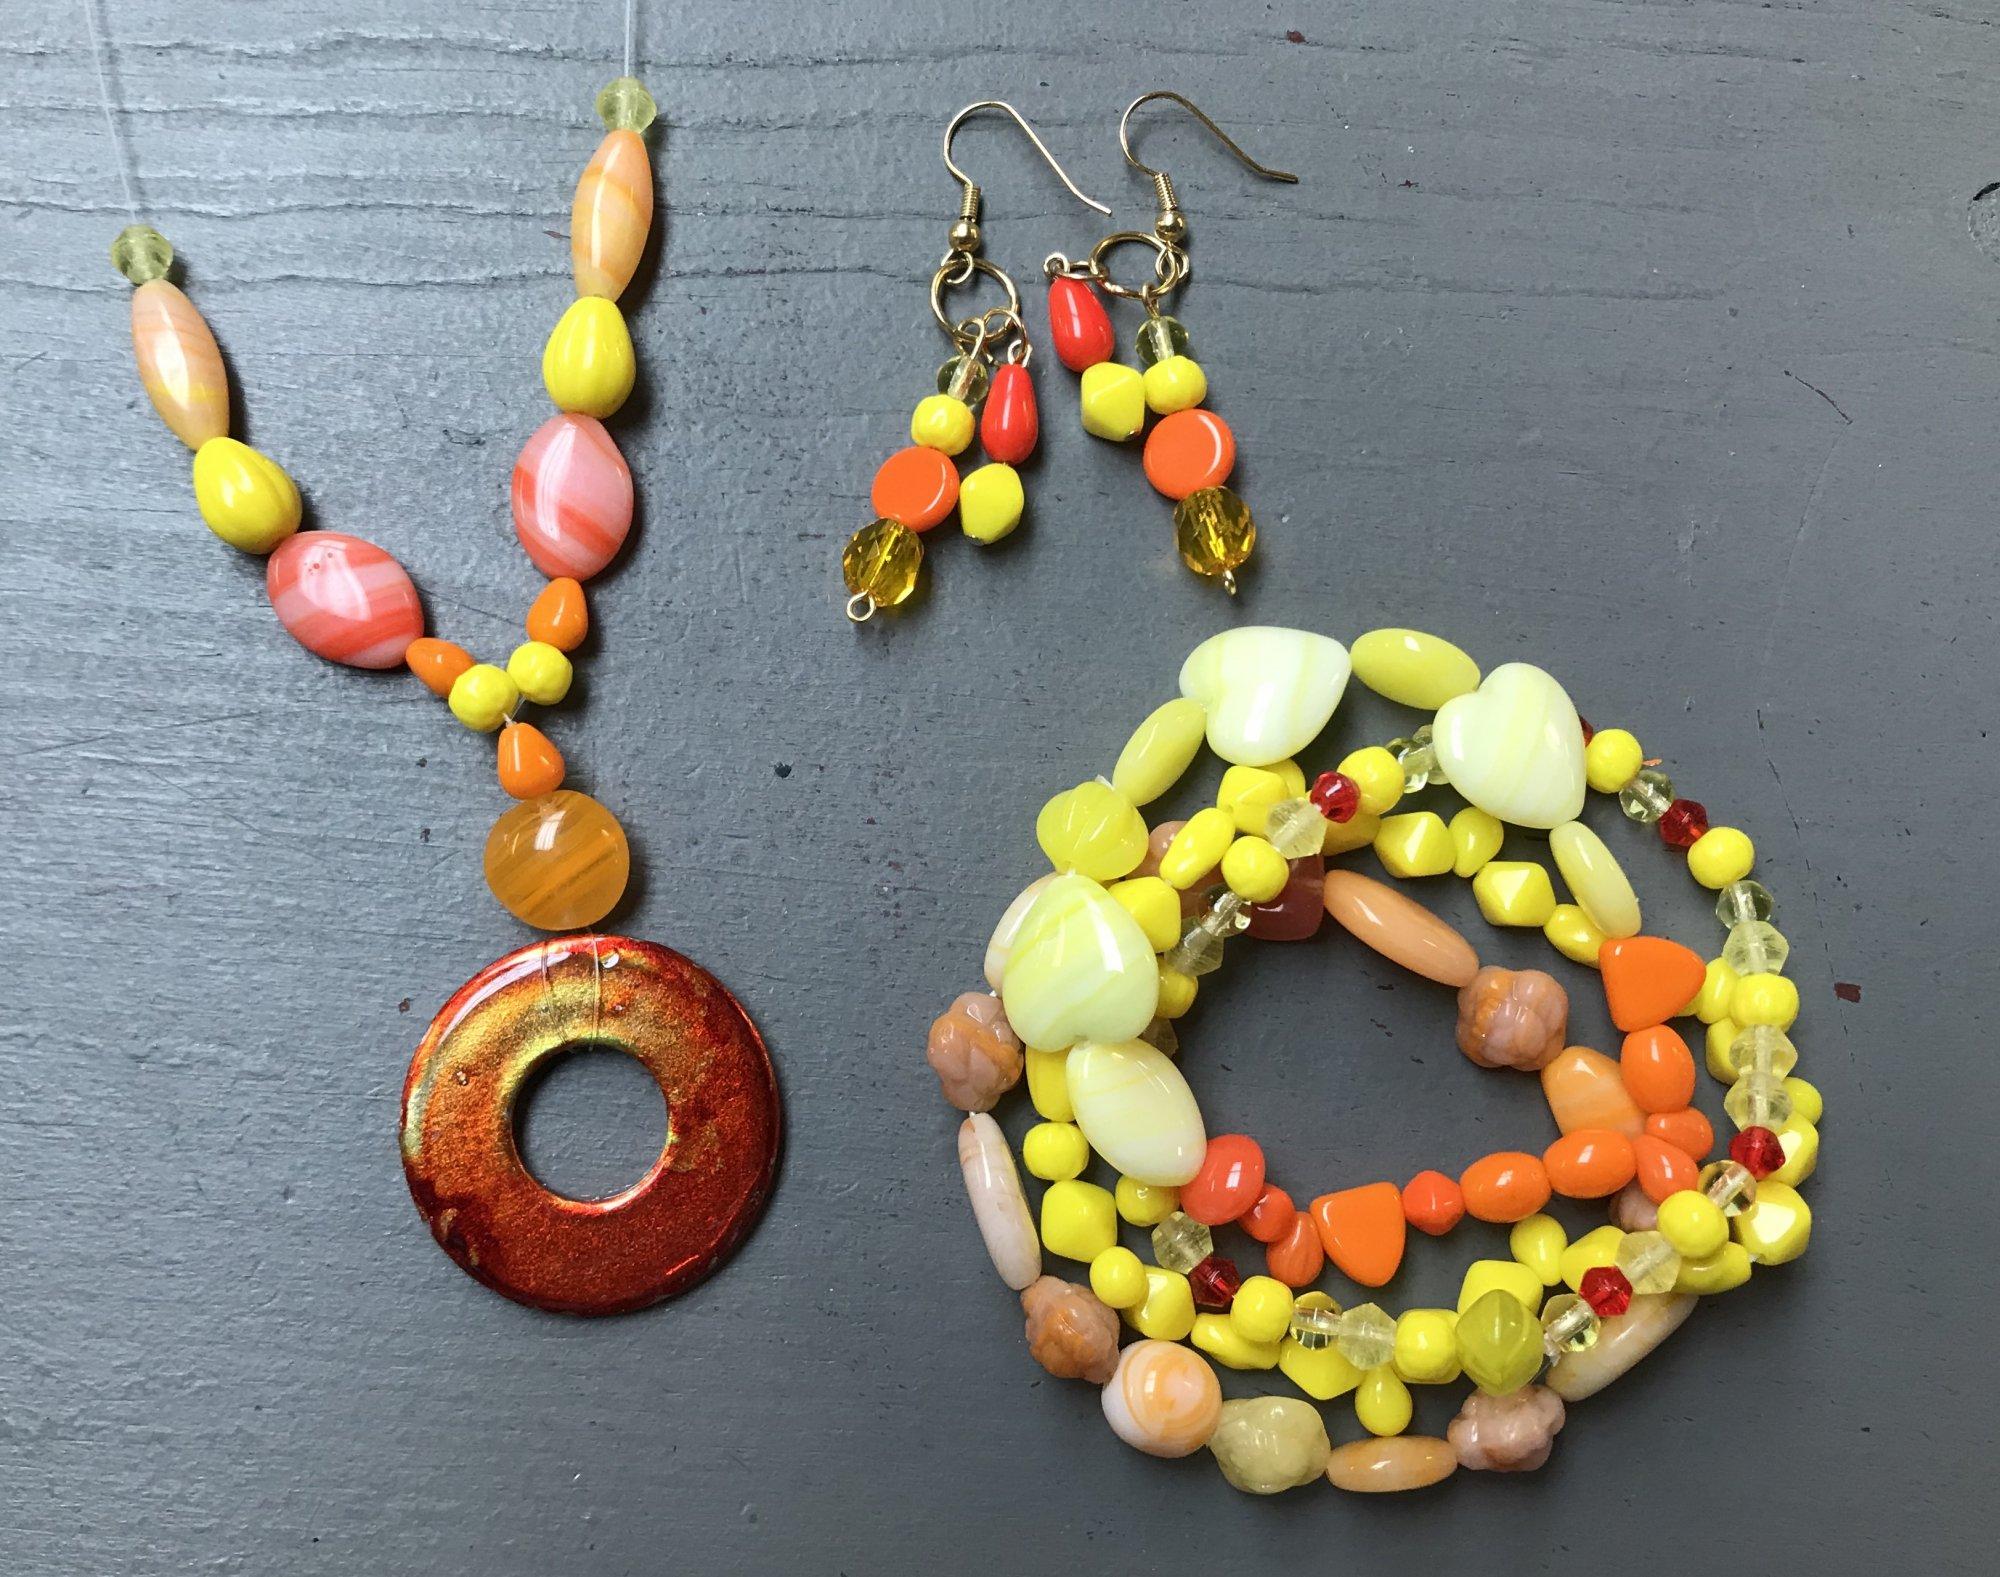 Basic Jewelry Making Studio Project